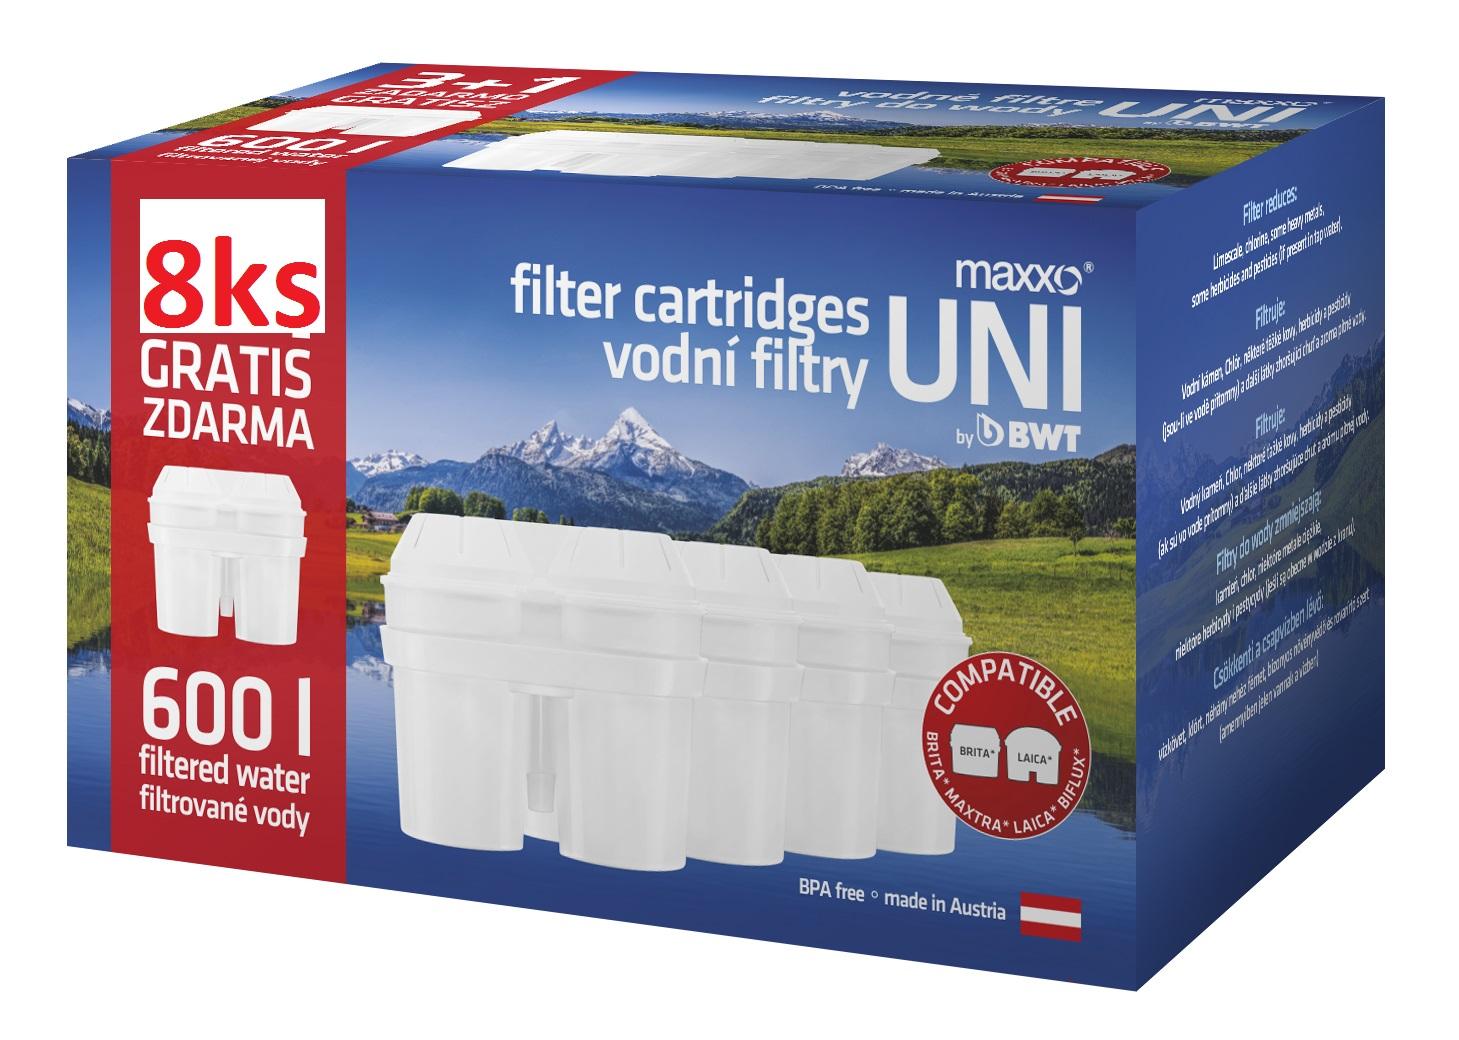 filtry do konvice MAXXO UNI 8ks (MAXXO 8)